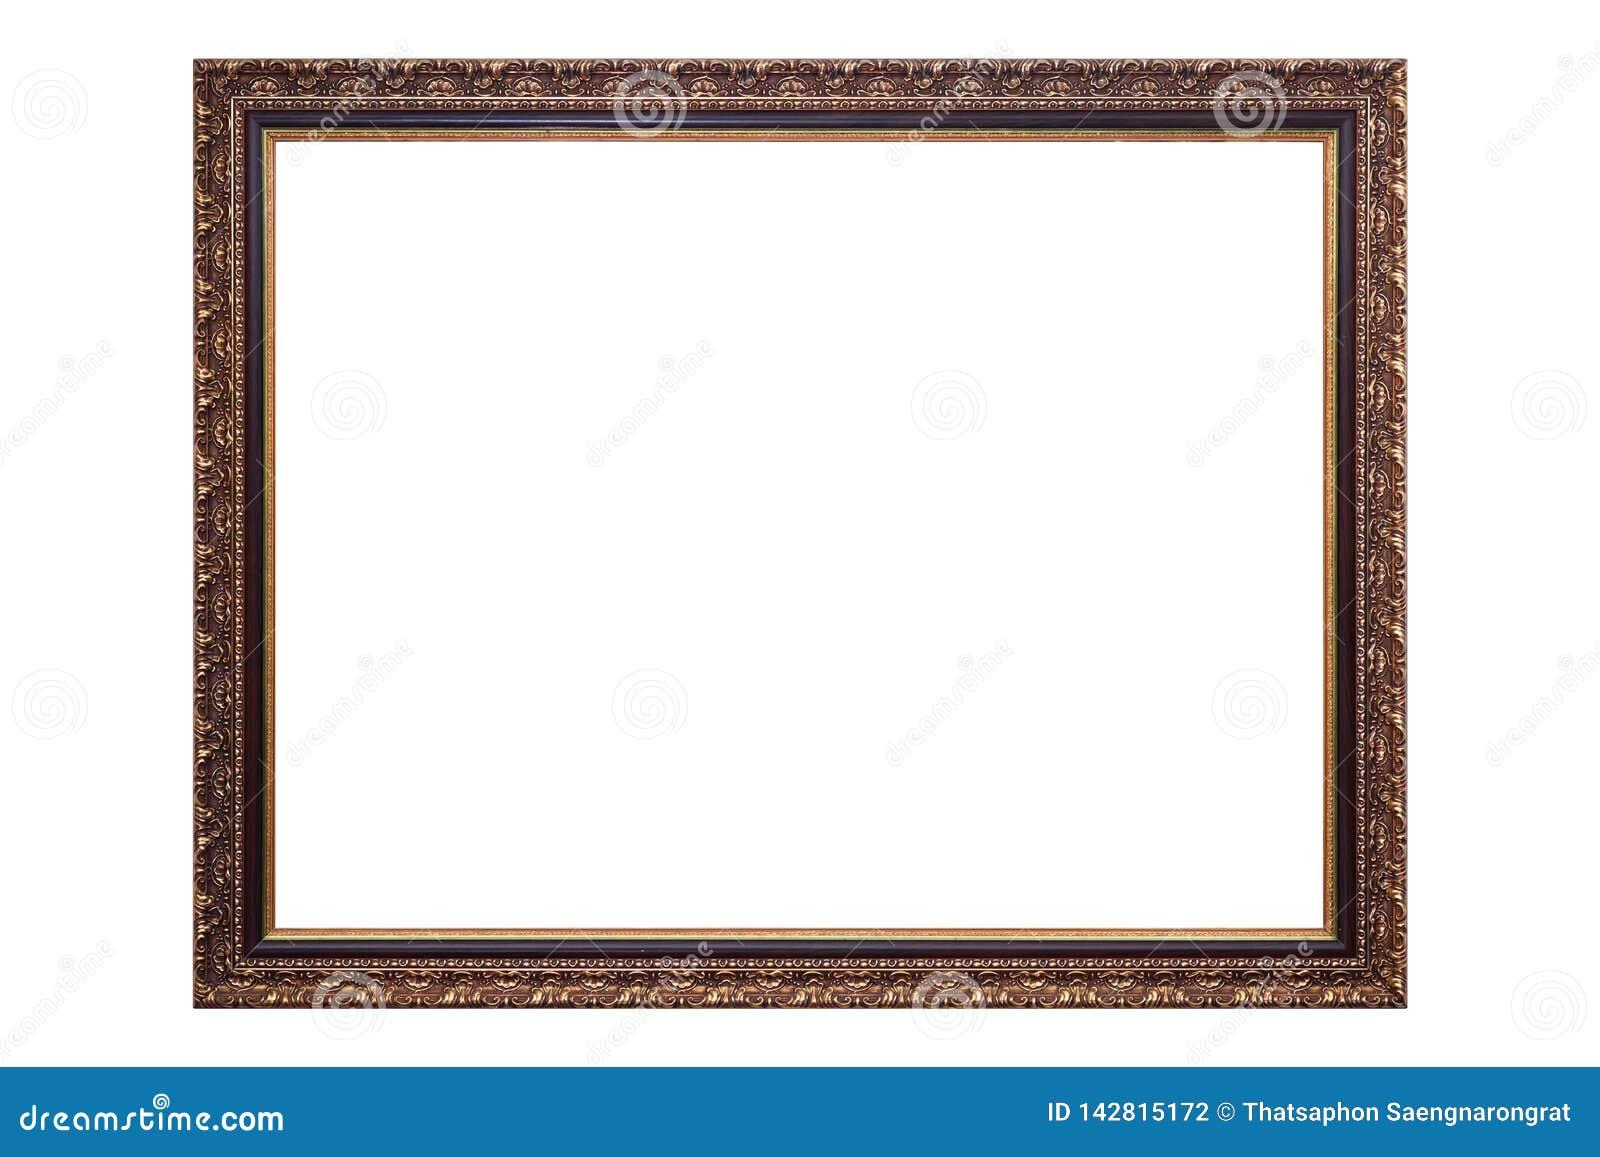 Moldura para retrato antiga do ouro isolada no fundo branco, trajeto de grampeamento